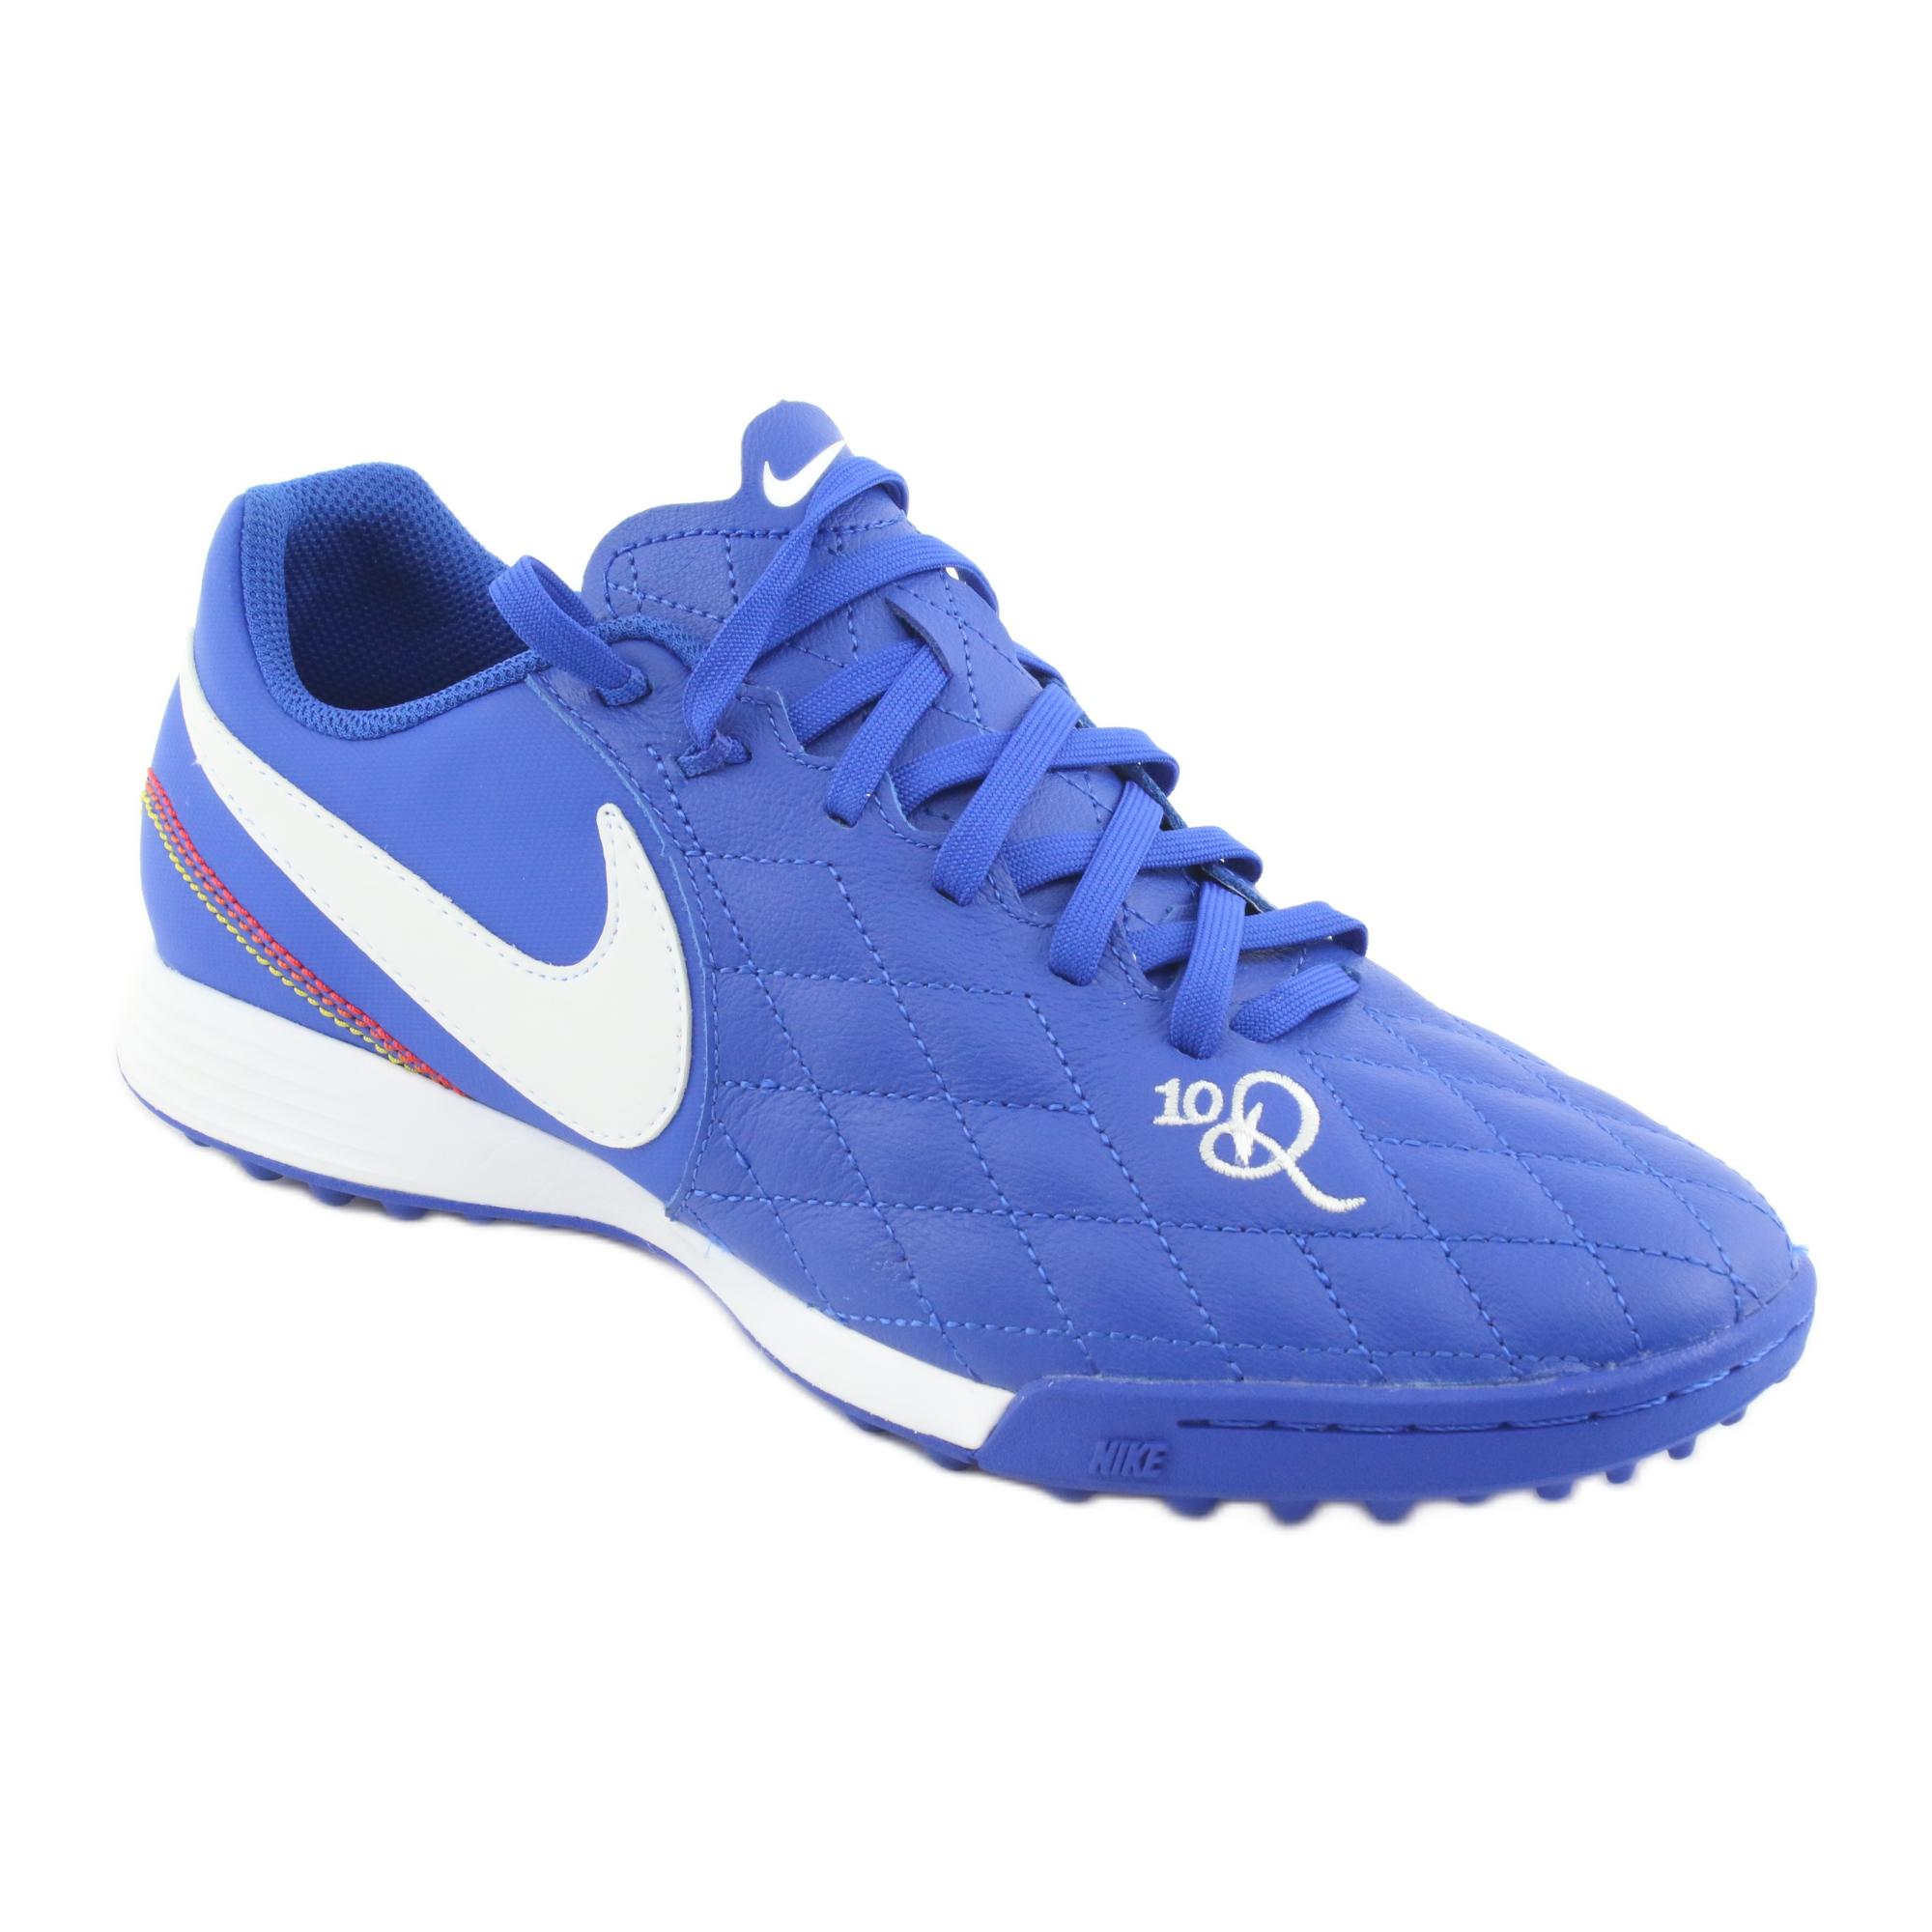 best service d1311 4da35 Football shoes Nike Tiempo Legend 7 Academy 10R Tf M AQ2218-410